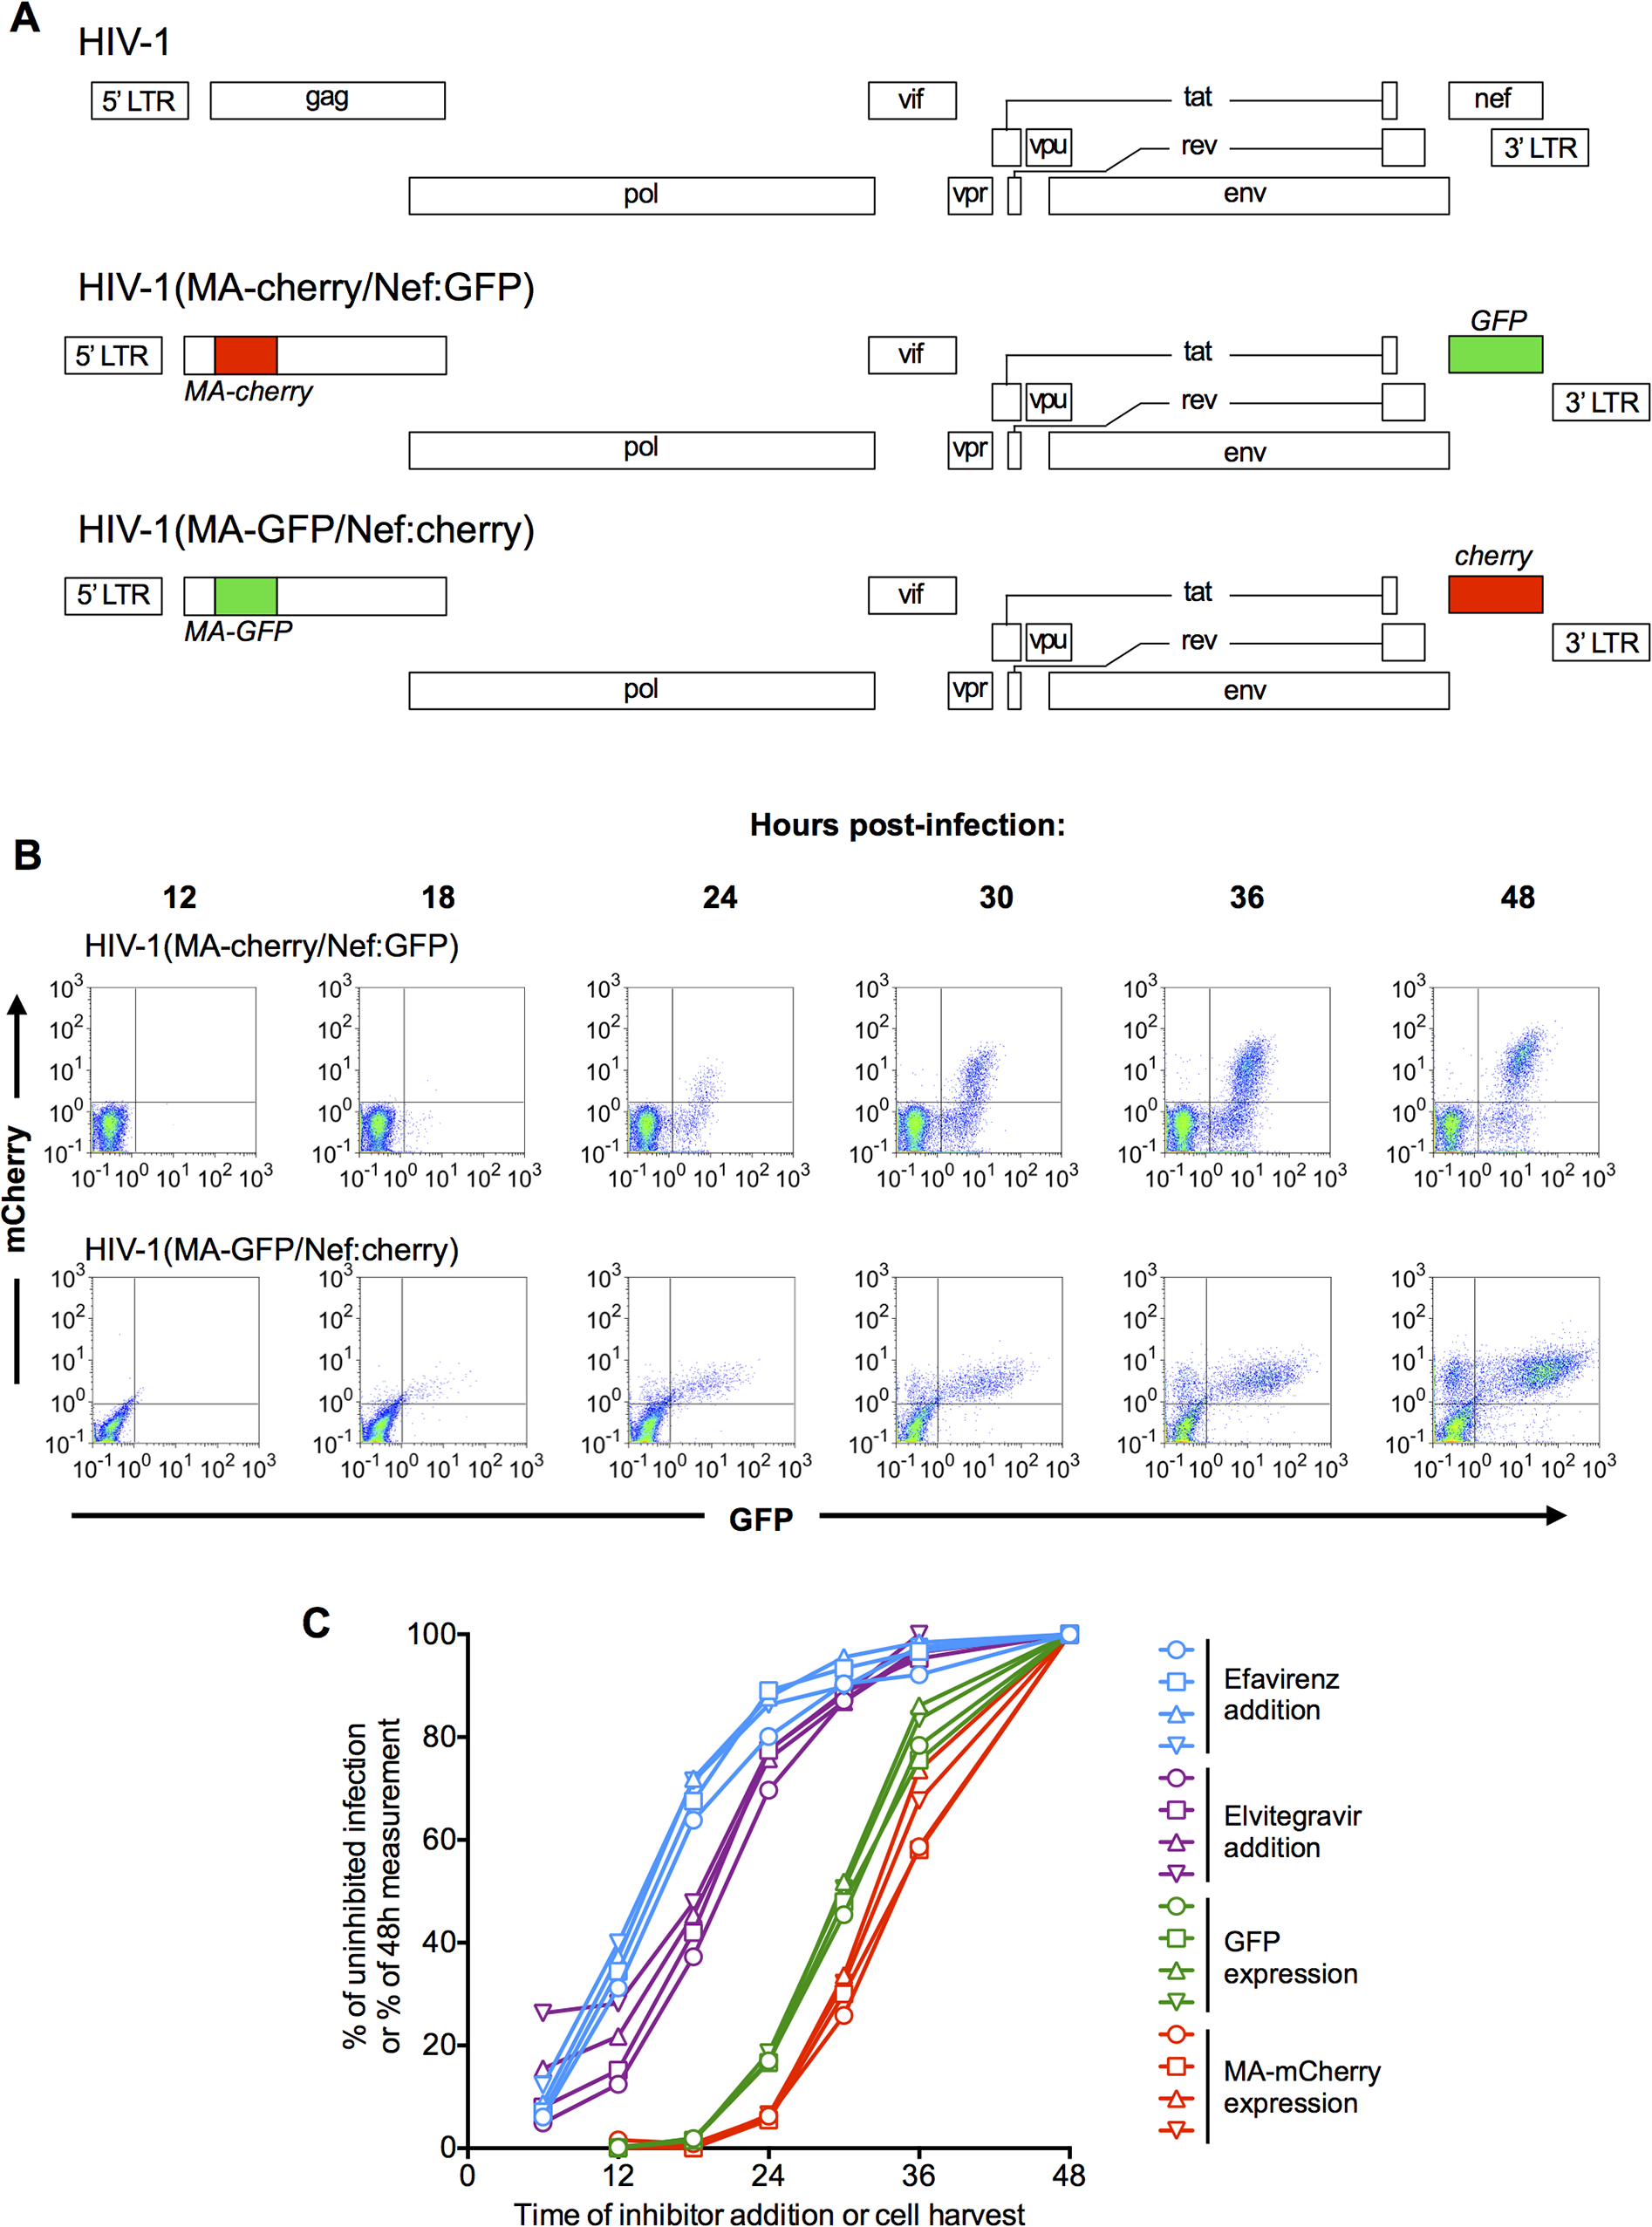 Dynamics of HIV-1 replication measured using dual reporter viruses.